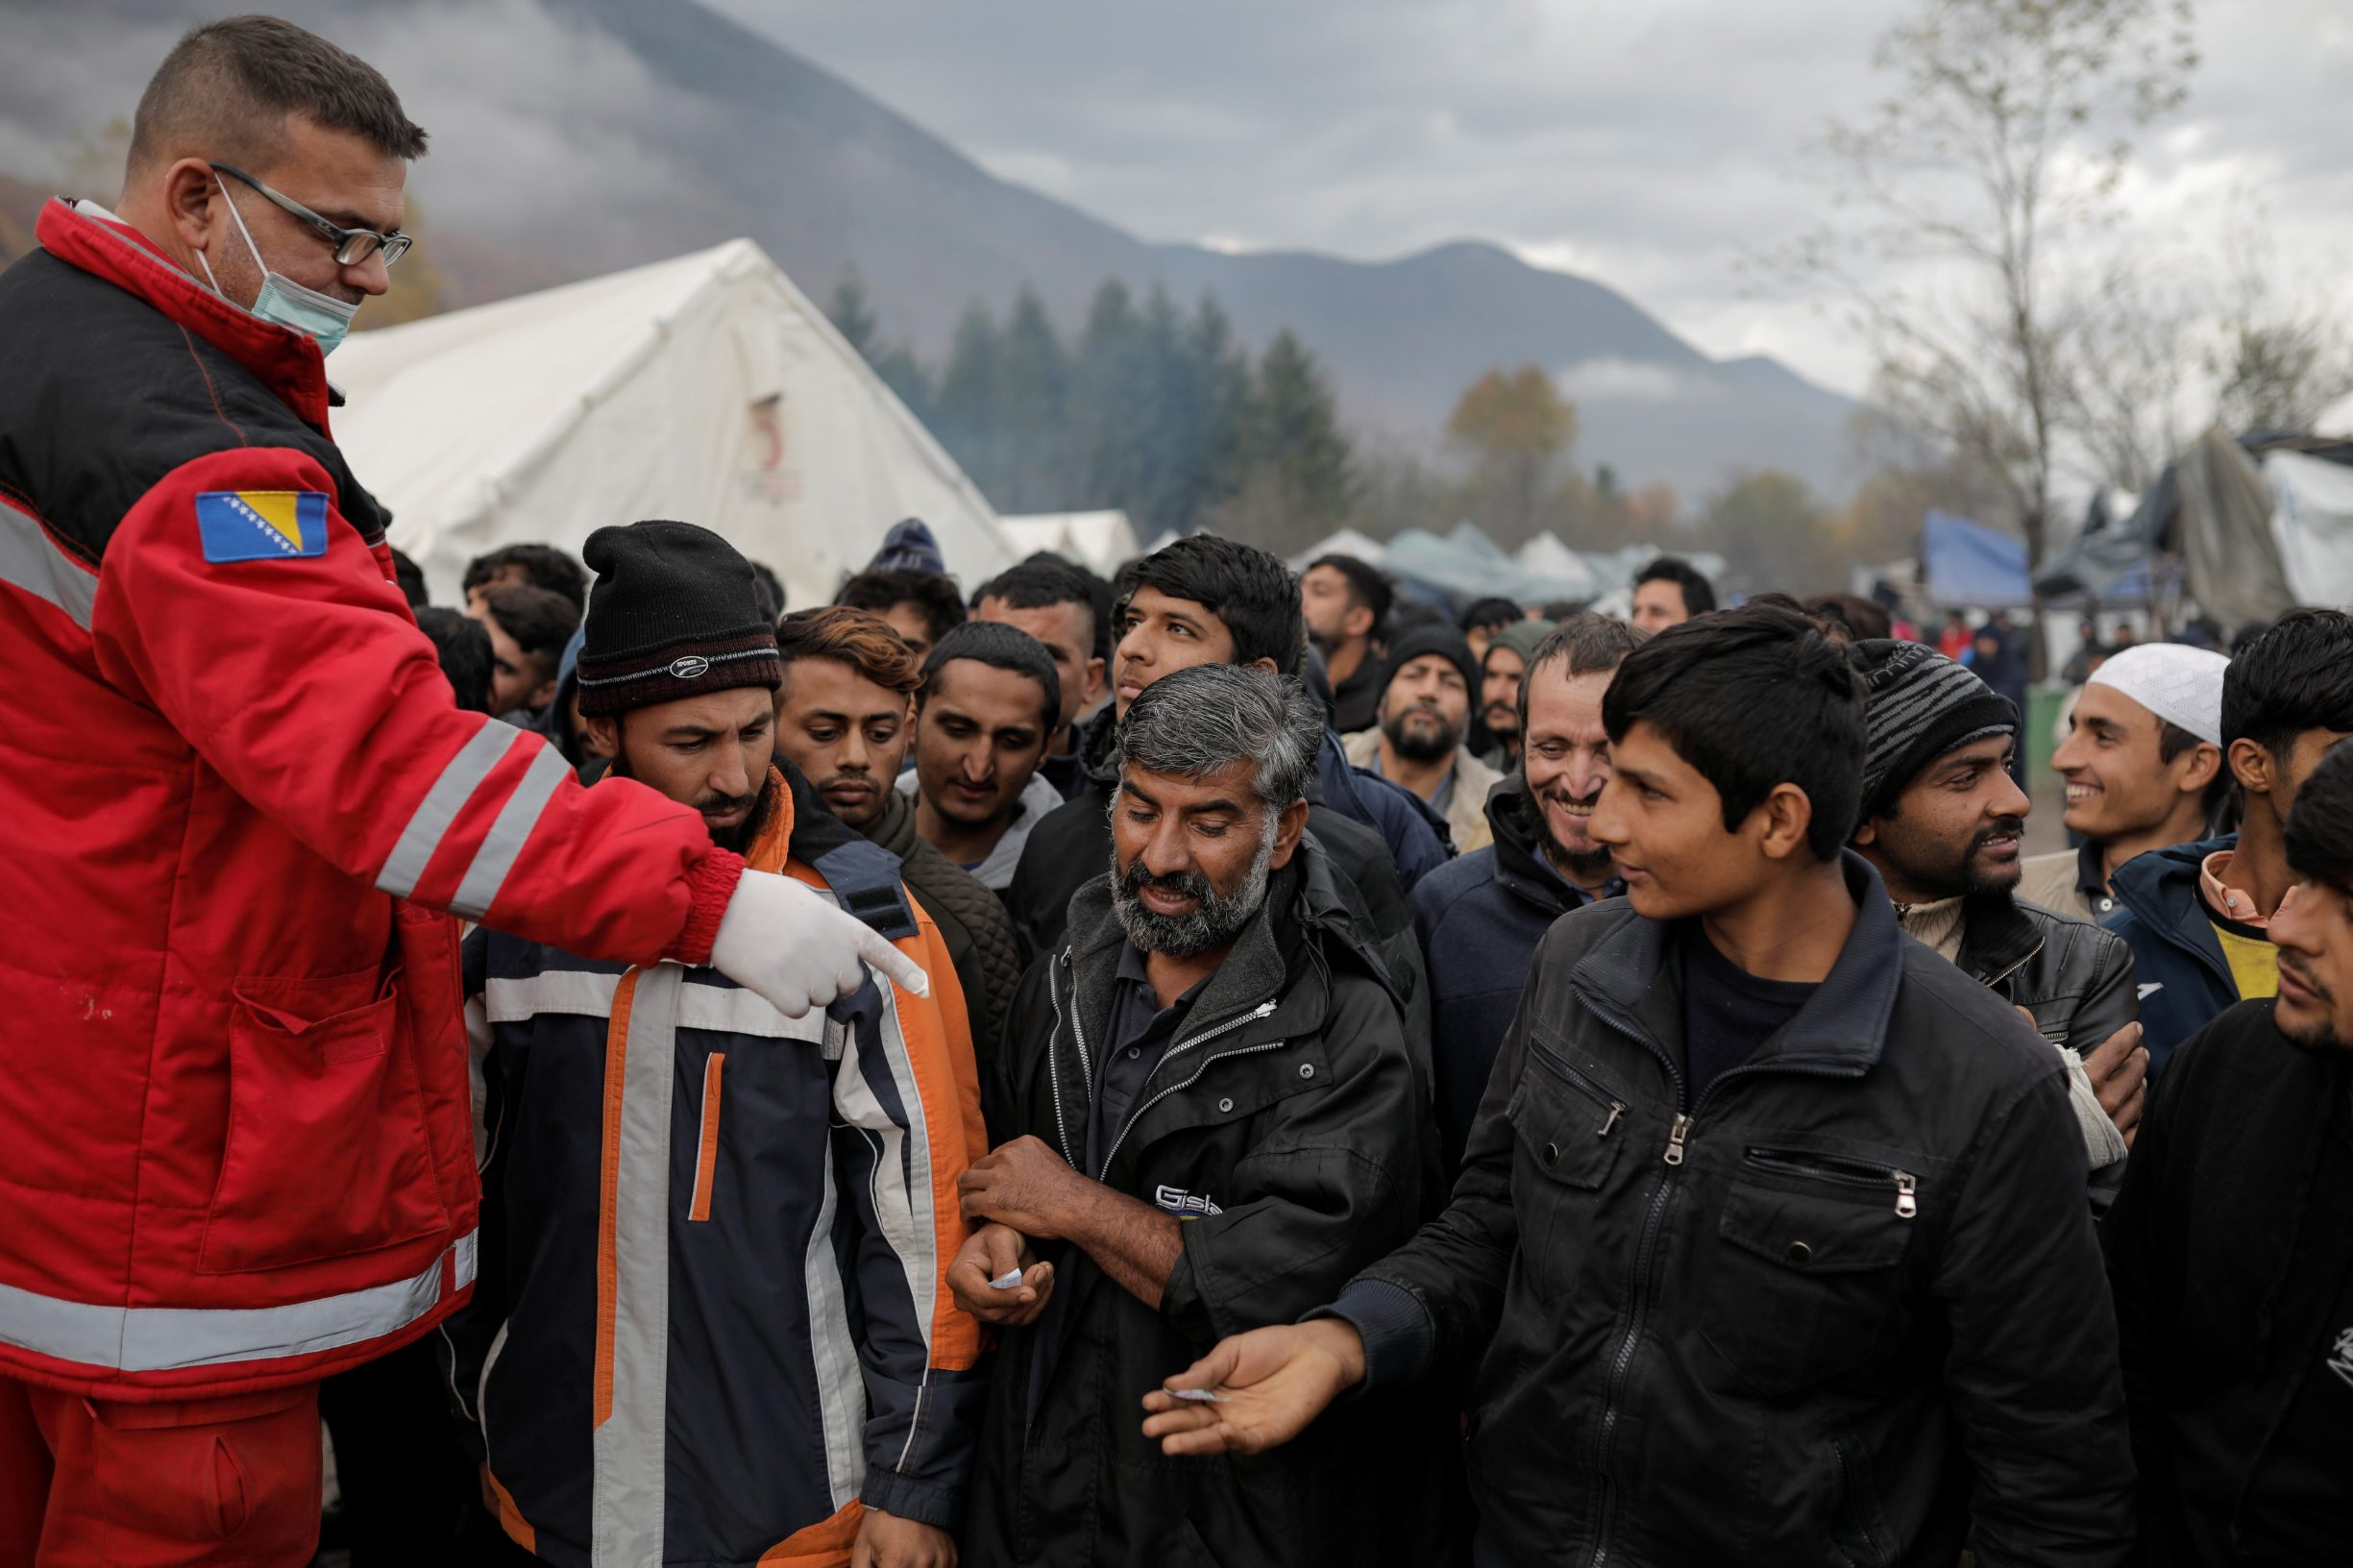 Migrants queue for free shoes delivery inside Vucjak camp near Bihac, Bosnia and Herzegovina, November 15, 2019. REUTERS/Marko Djurica